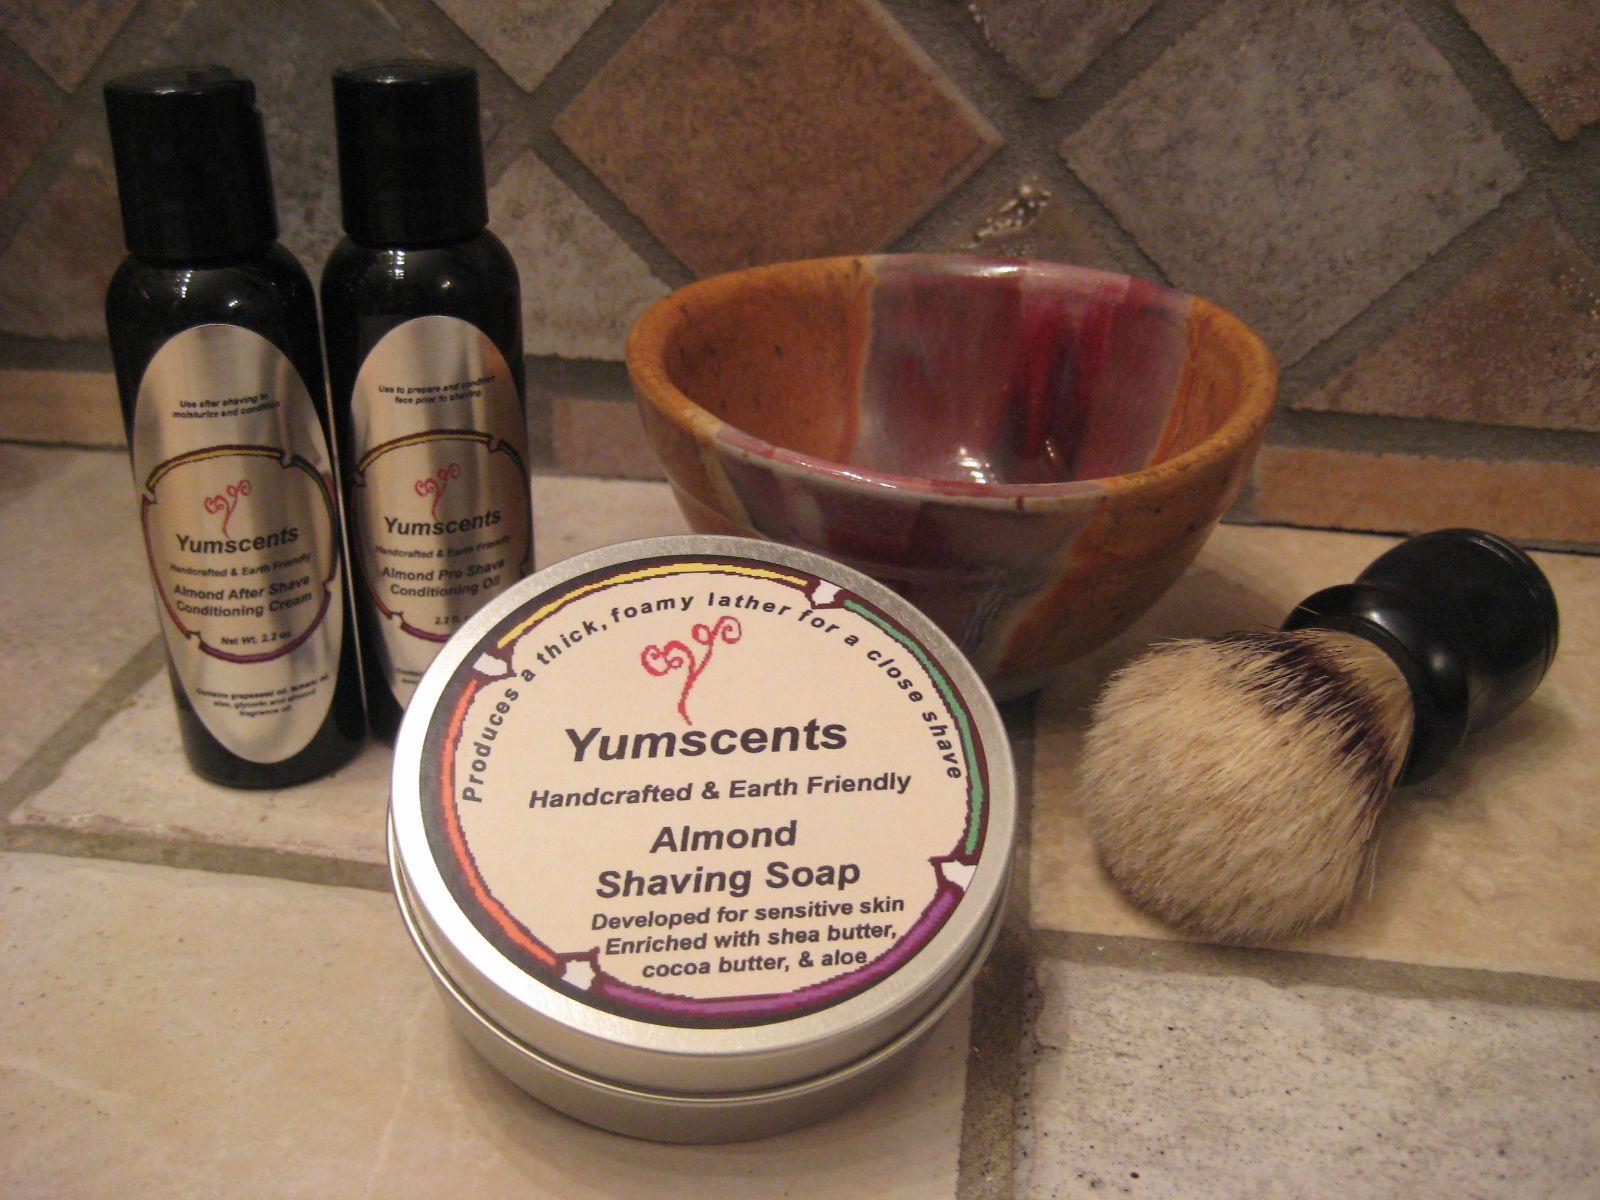 Large shaving kit with bowl or mug